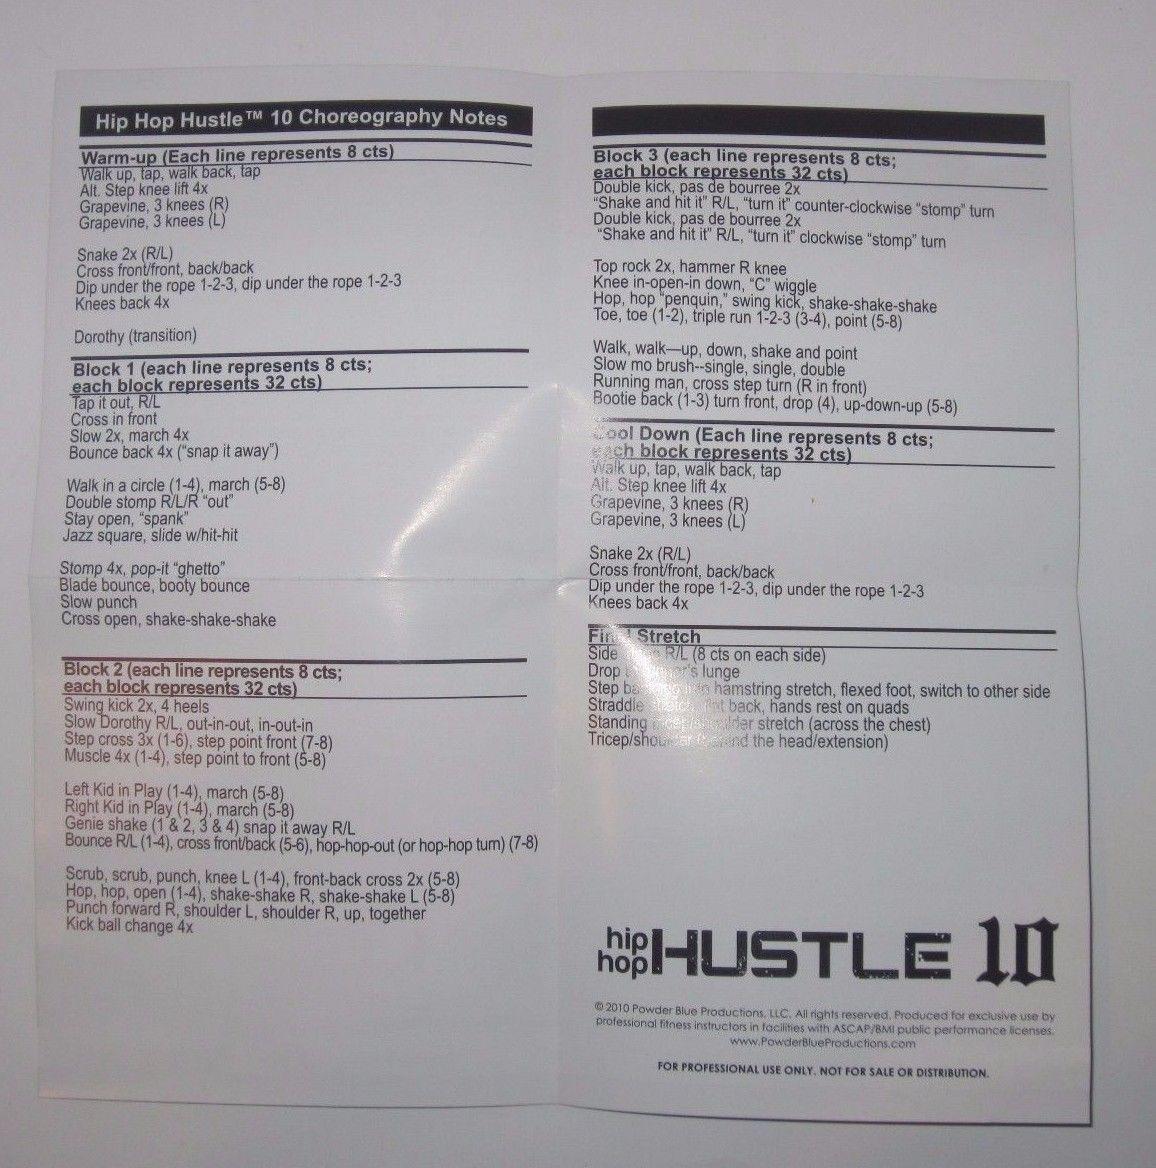 HIP HOP HUSTLE Vol. 10 Workout DVD - Chalene Johnson - Powder Blue Productions!